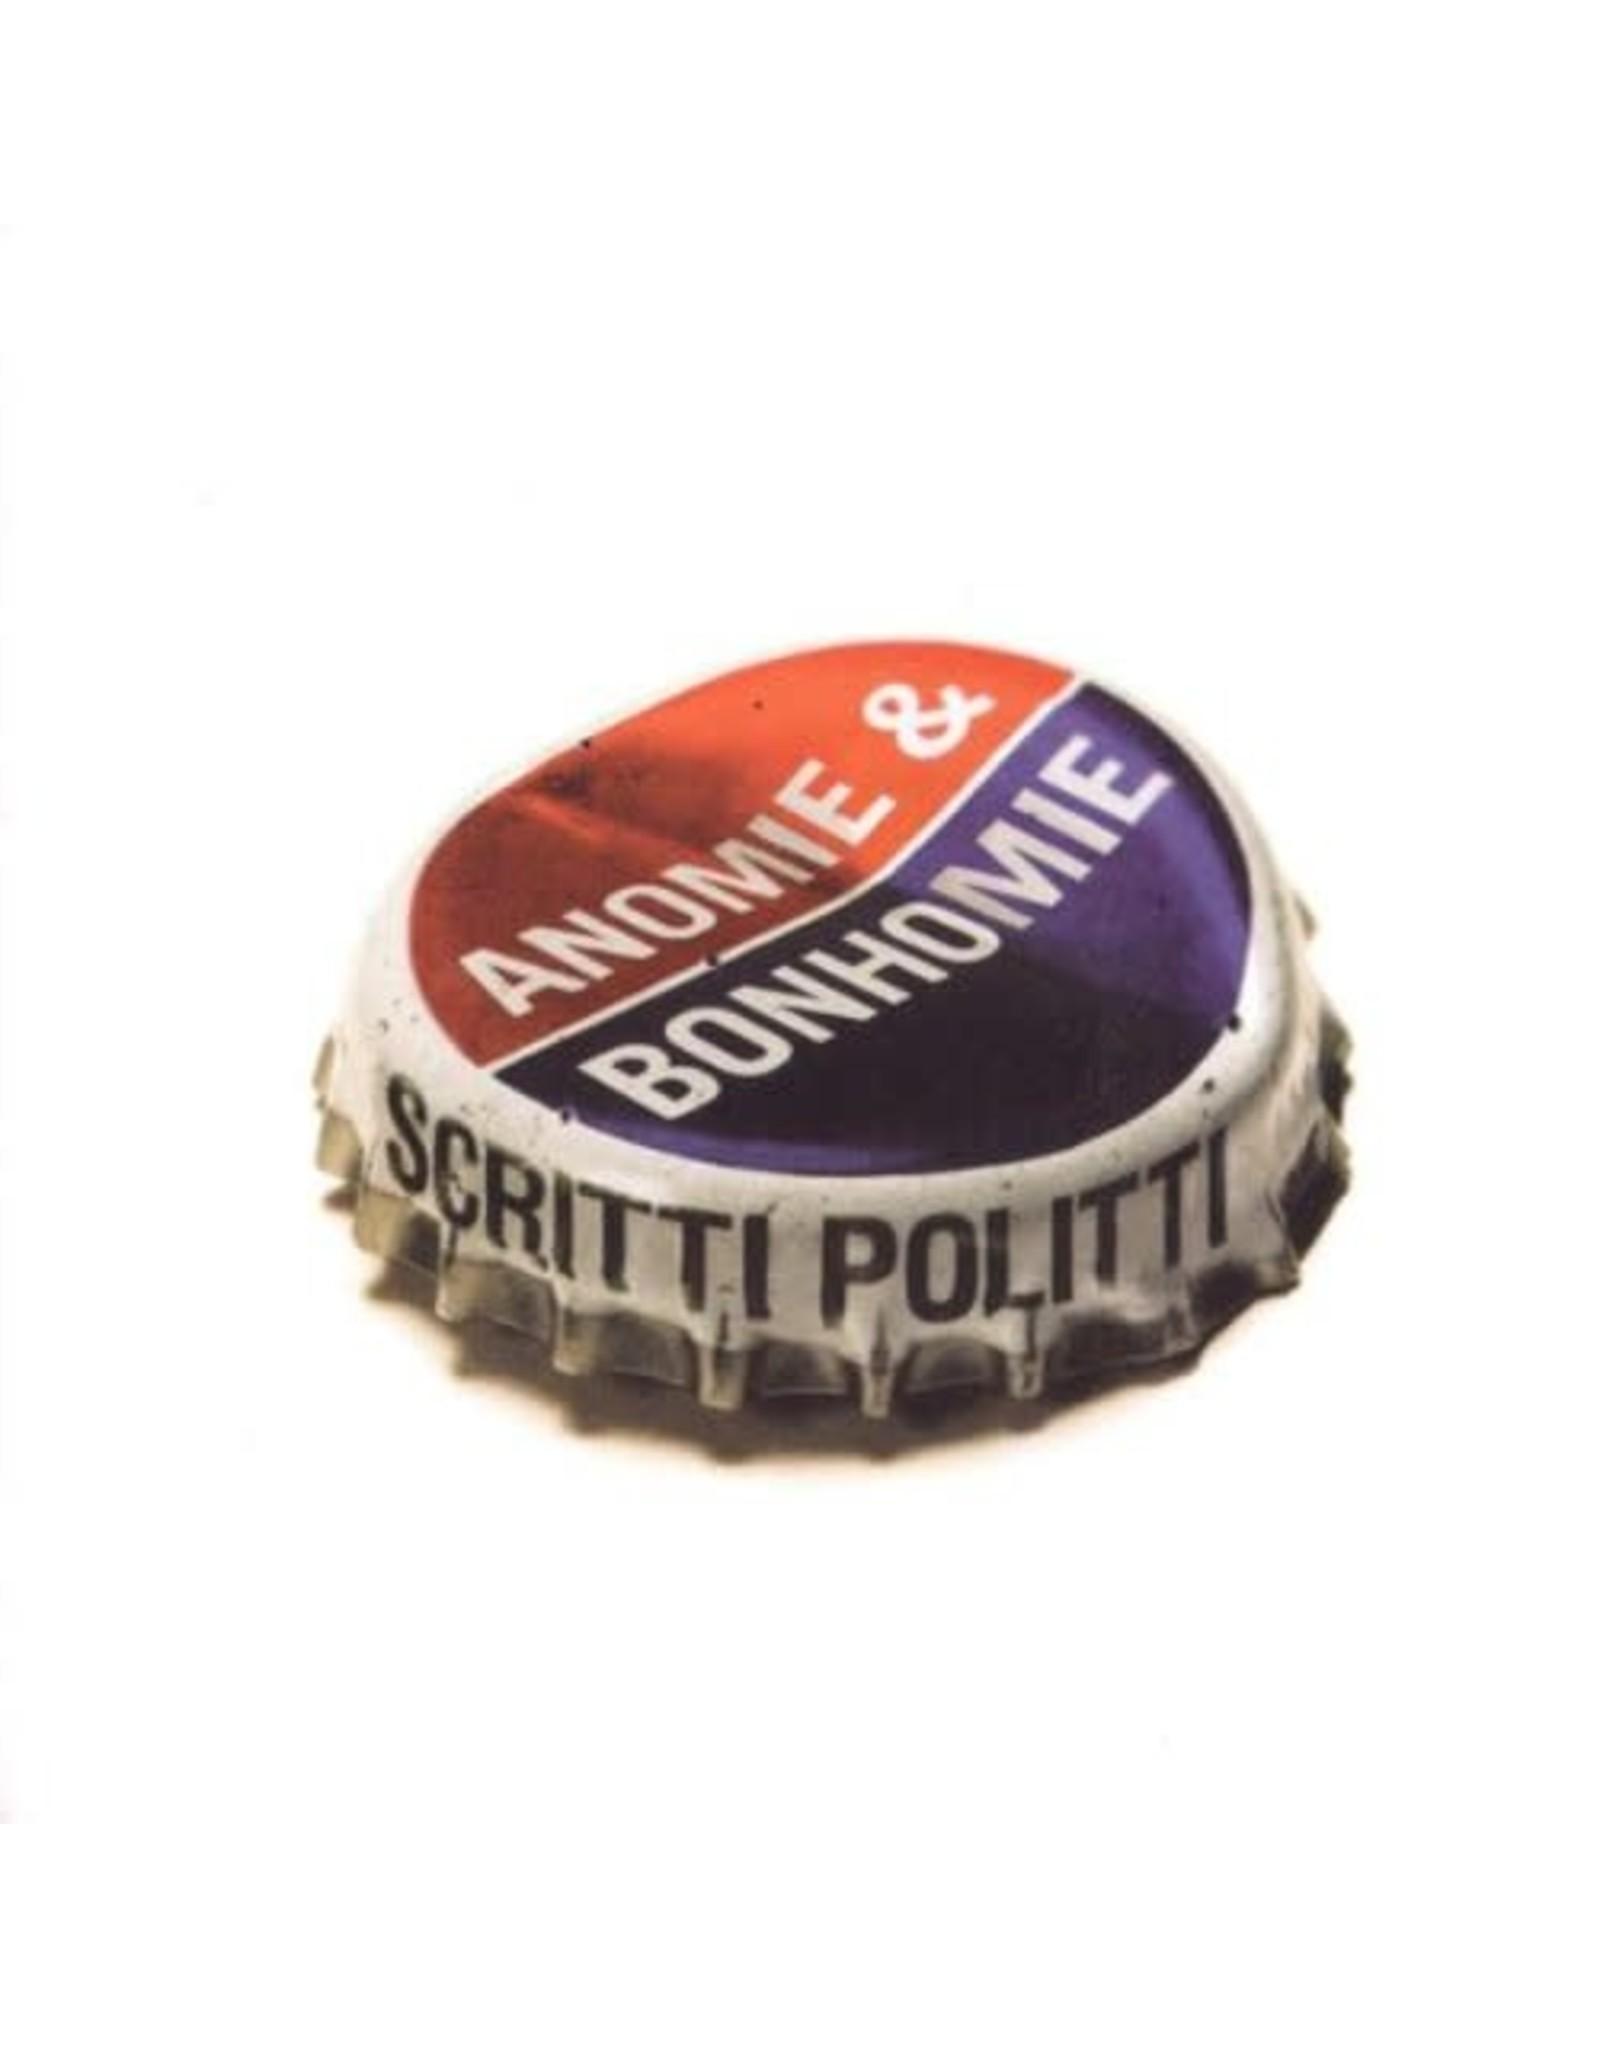 New Vinyl Scritti Politti - Anomie & Bonhomie 2LP